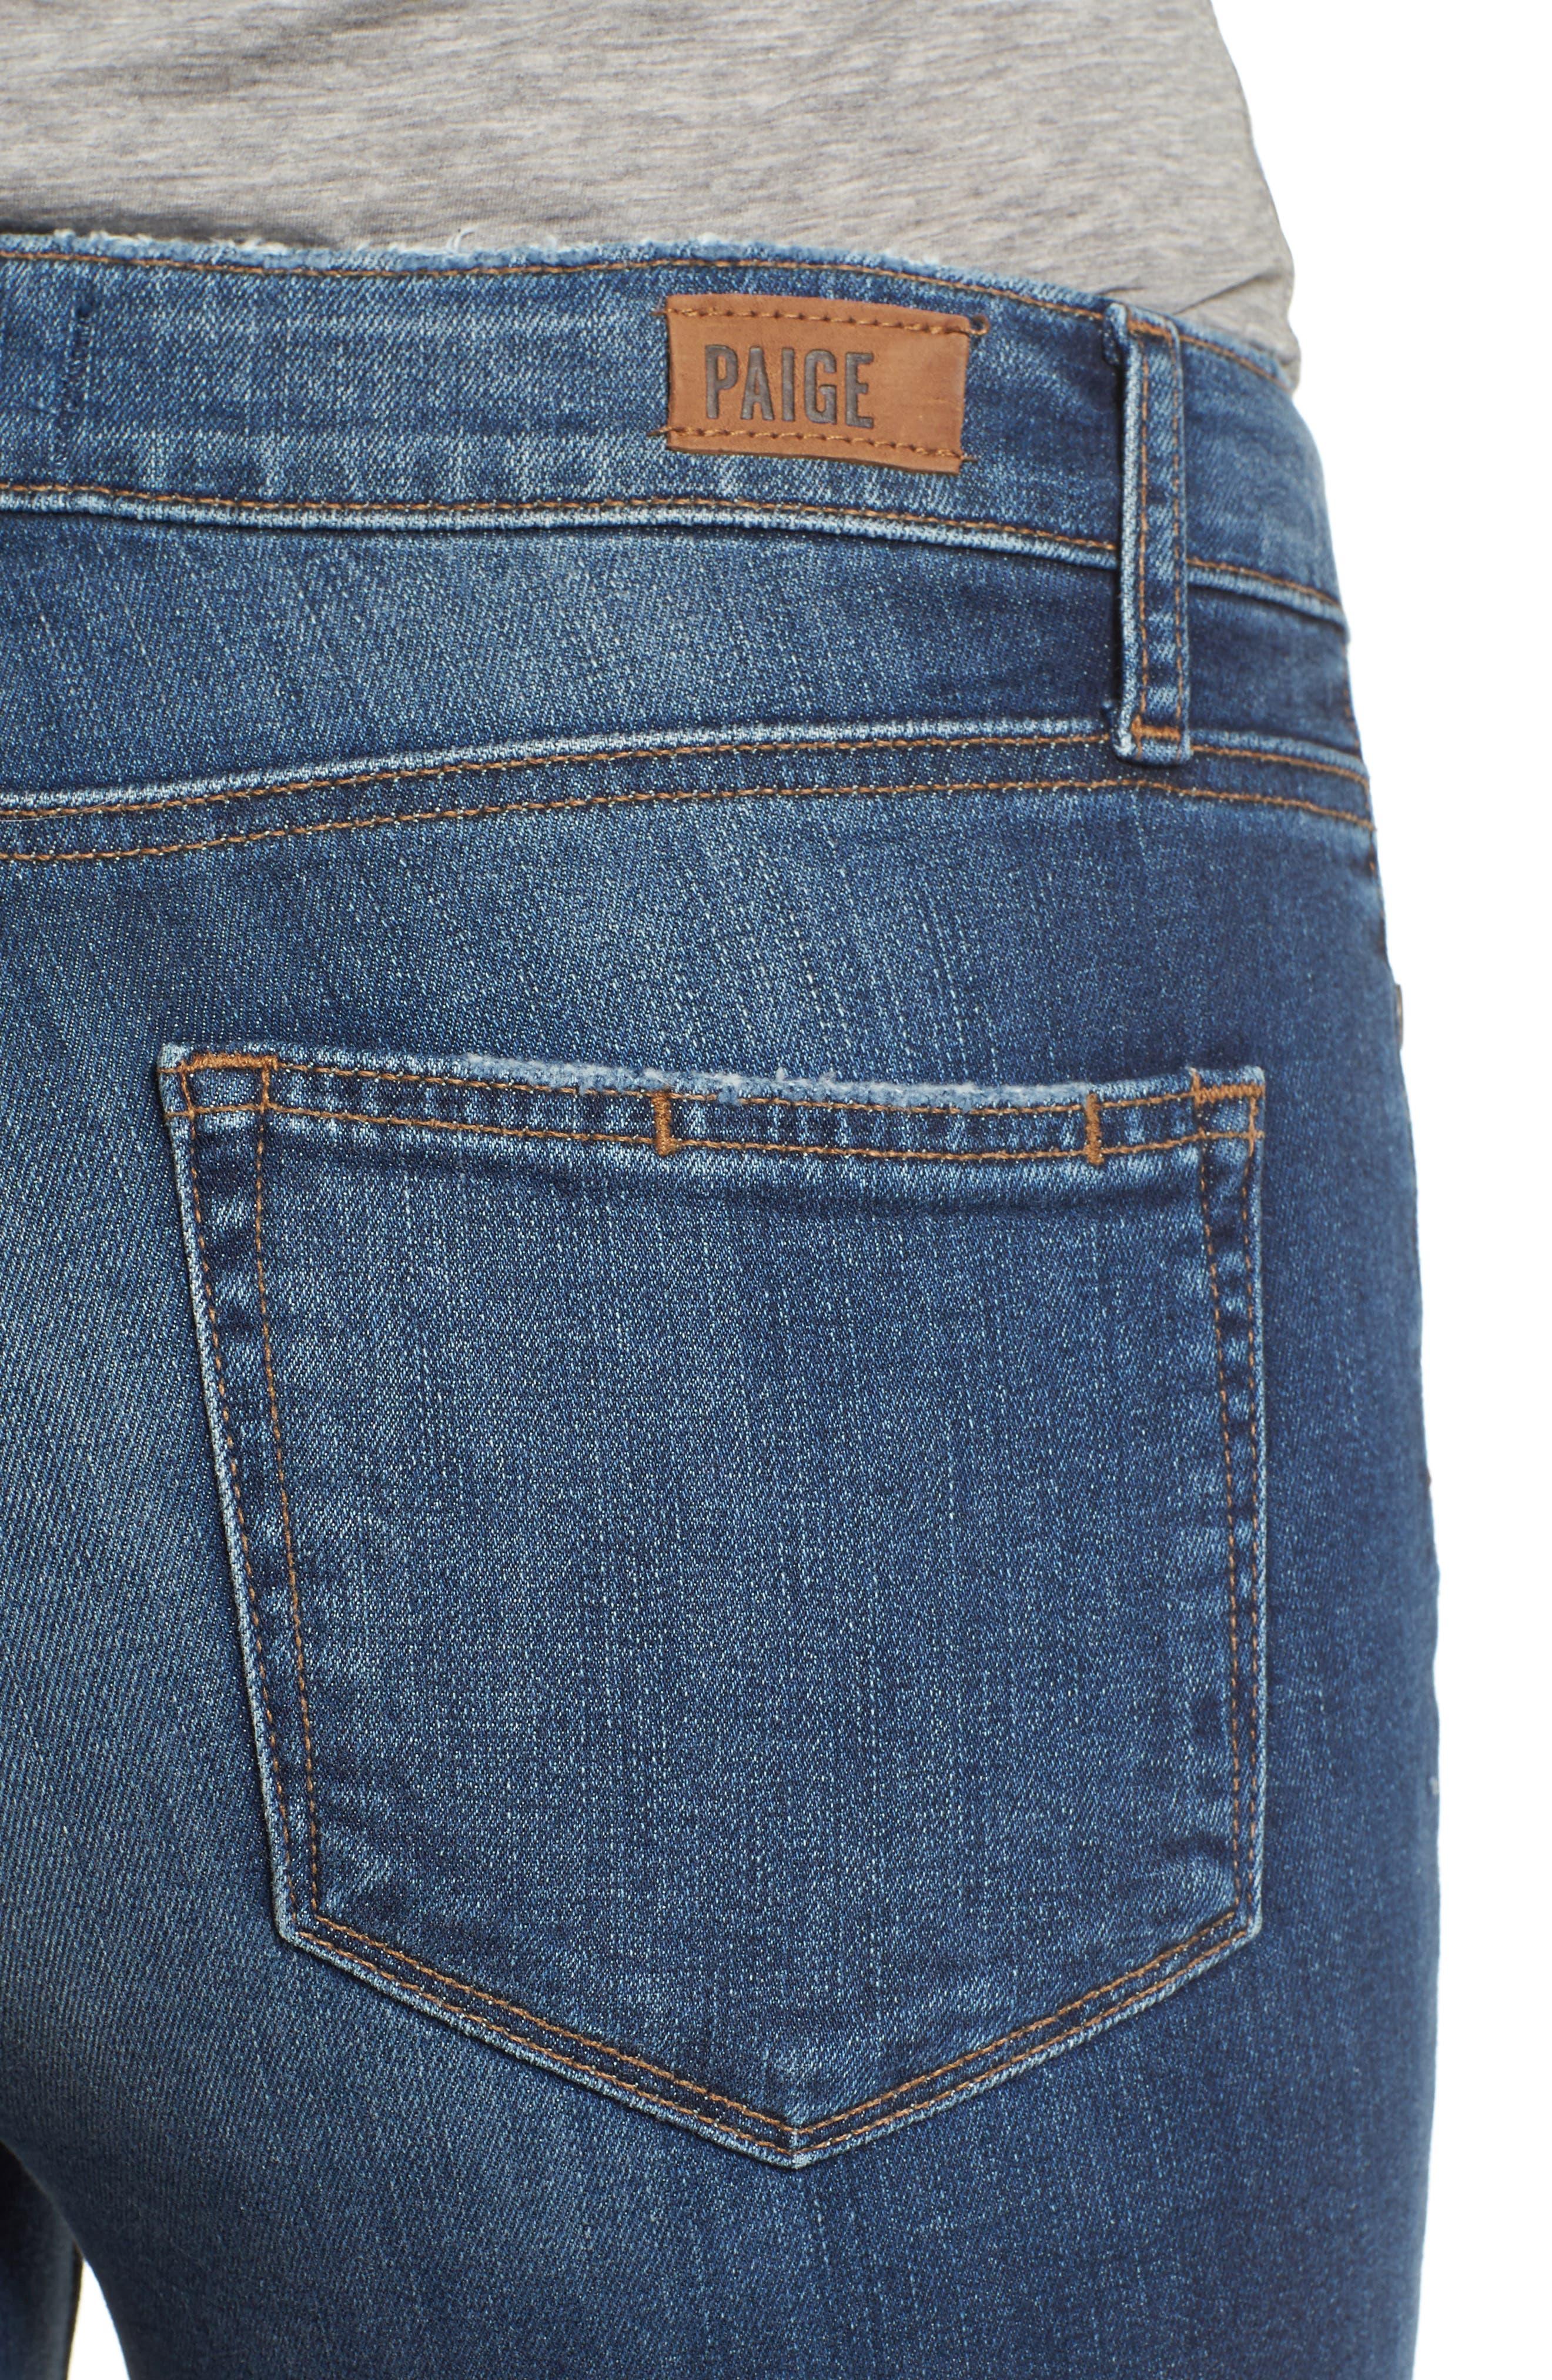 Transcend - Hoxton High Waist Crop Skinny Jeans,                             Alternate thumbnail 4, color,                             400